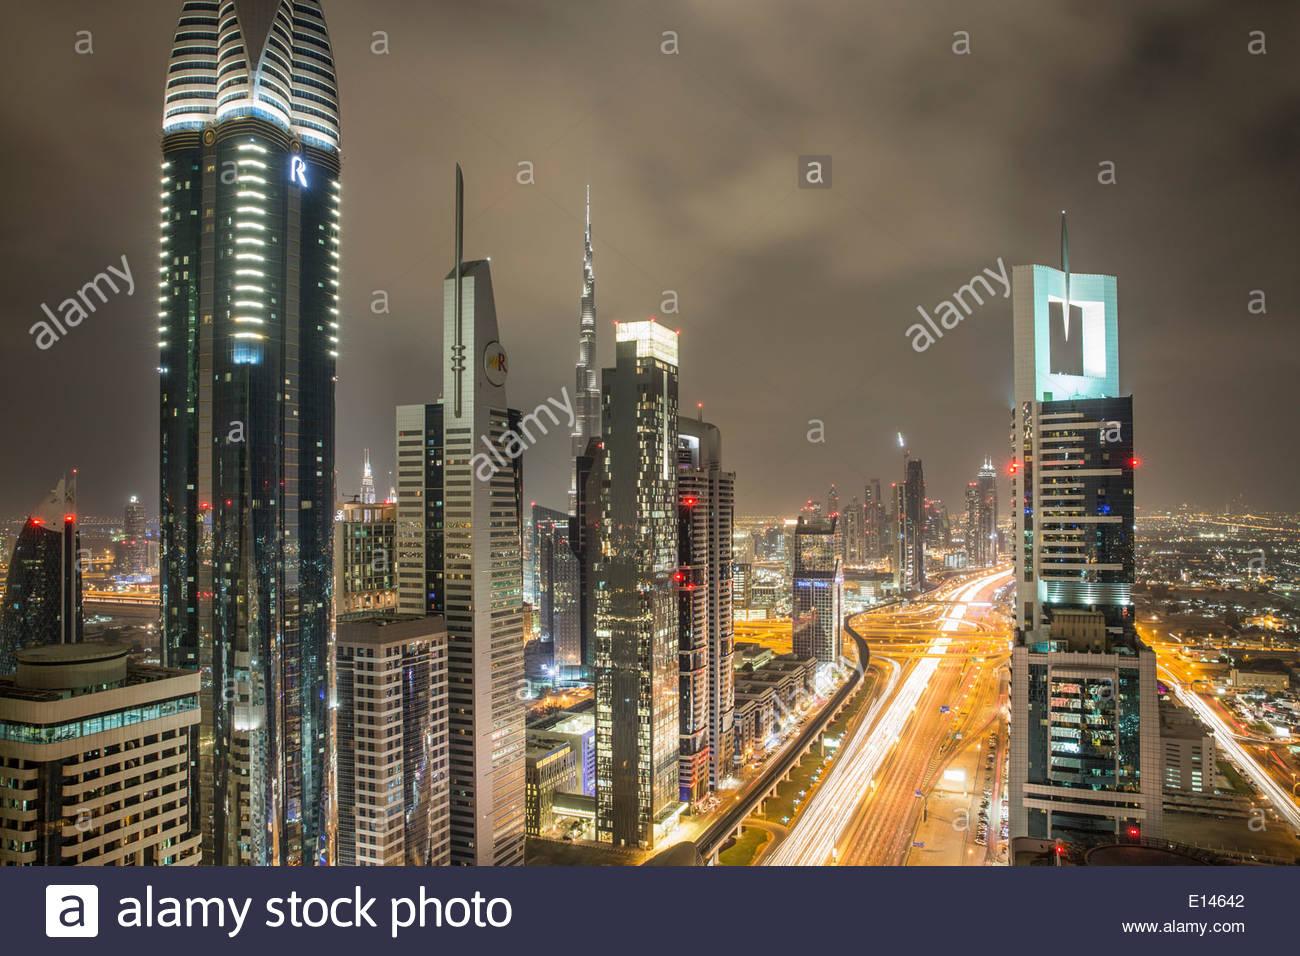 United Arab Emirates, Dubai, Sheikh Zayed Road crosses the financial city center with Burj Khalifa, Night - Stock Image